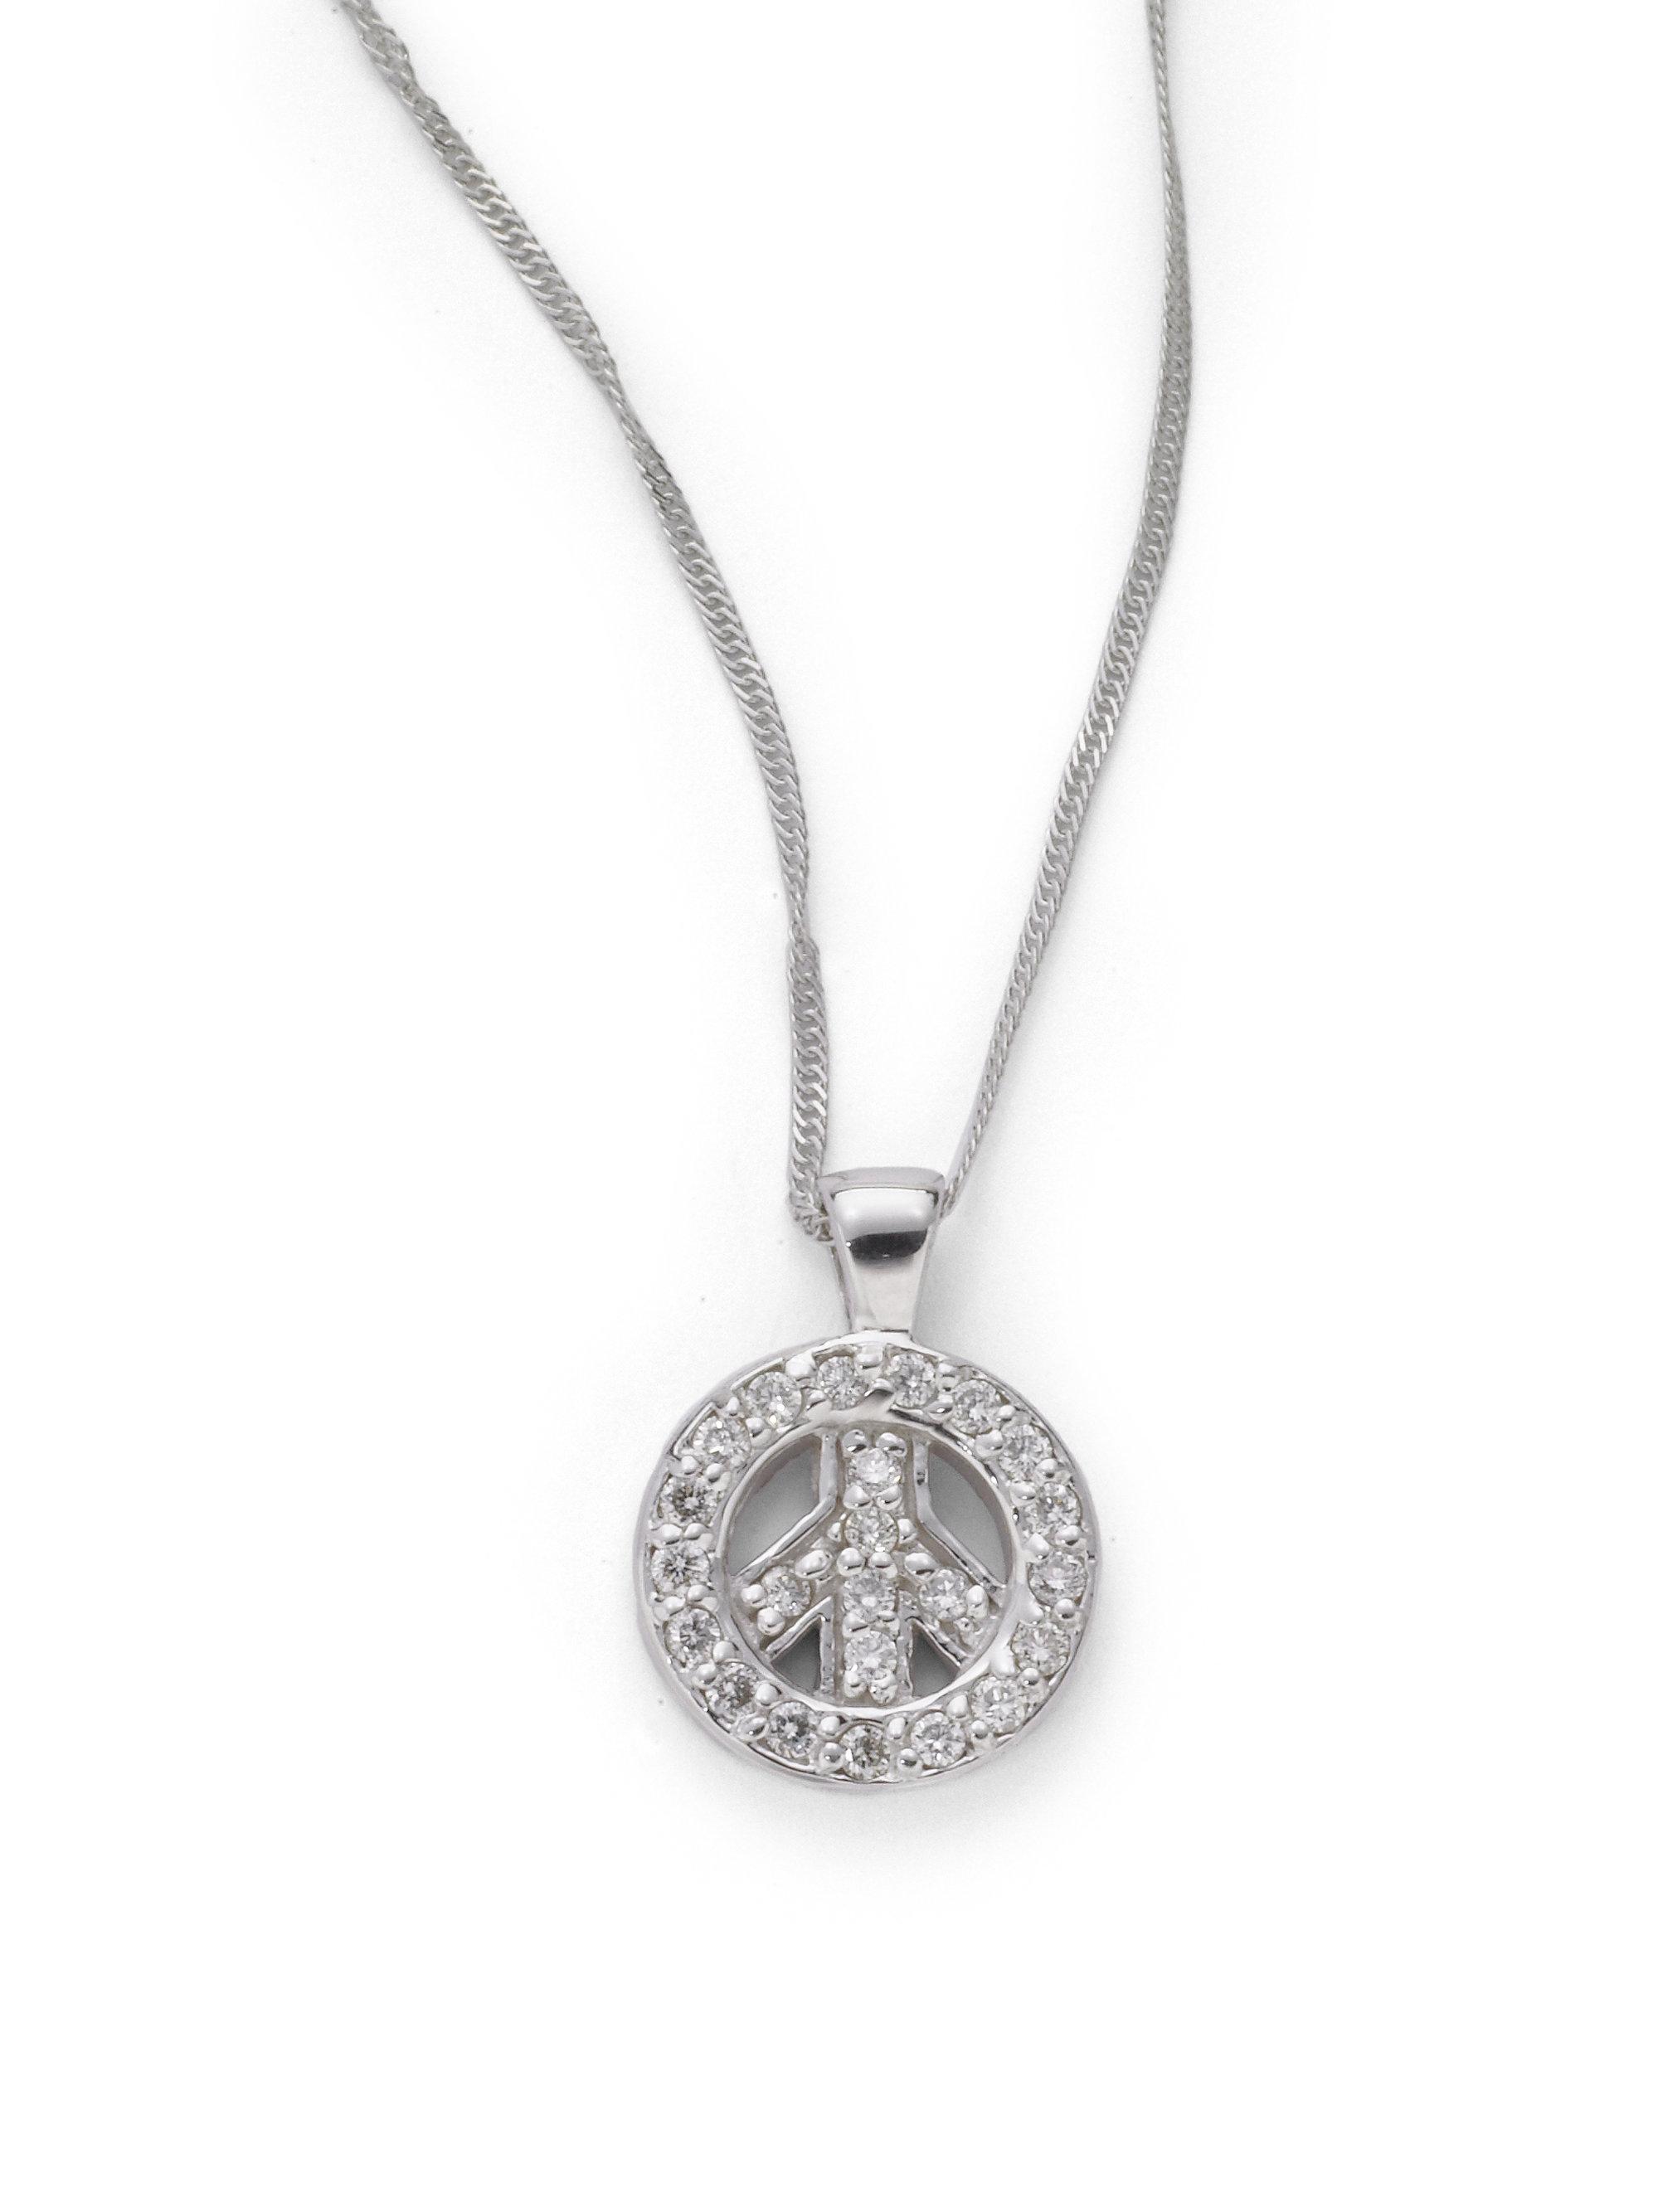 kc designs diamond small peace sign pendant necklace in. Black Bedroom Furniture Sets. Home Design Ideas